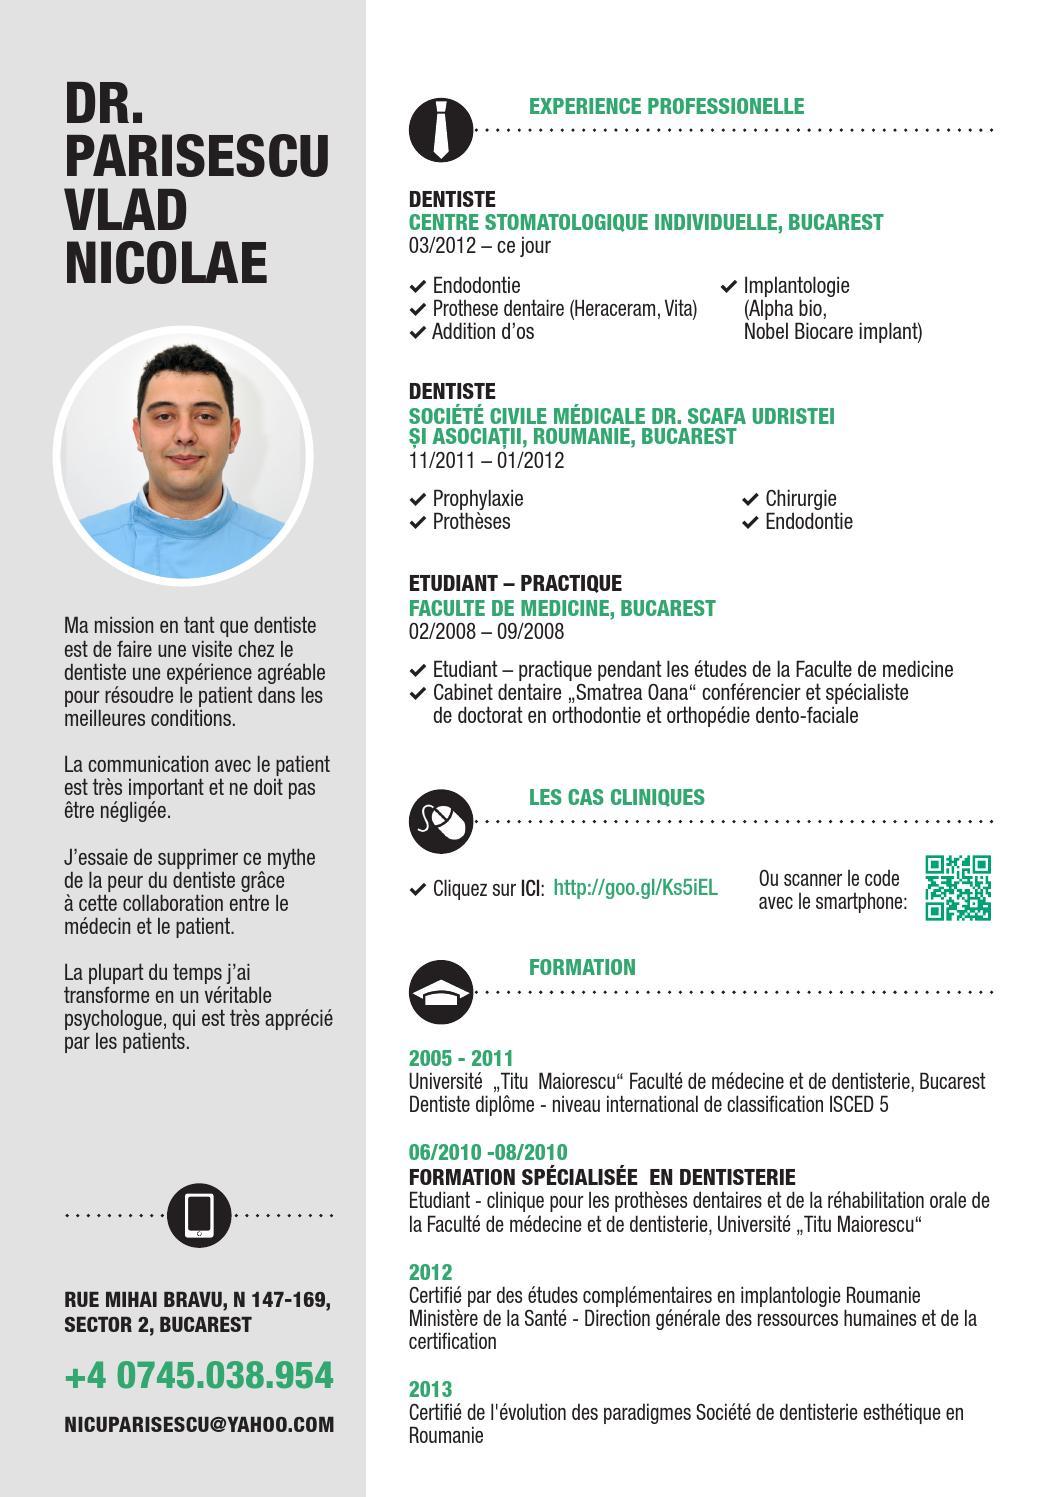 curriculum vitae dr  parisescu vlad nicolae by parisescu